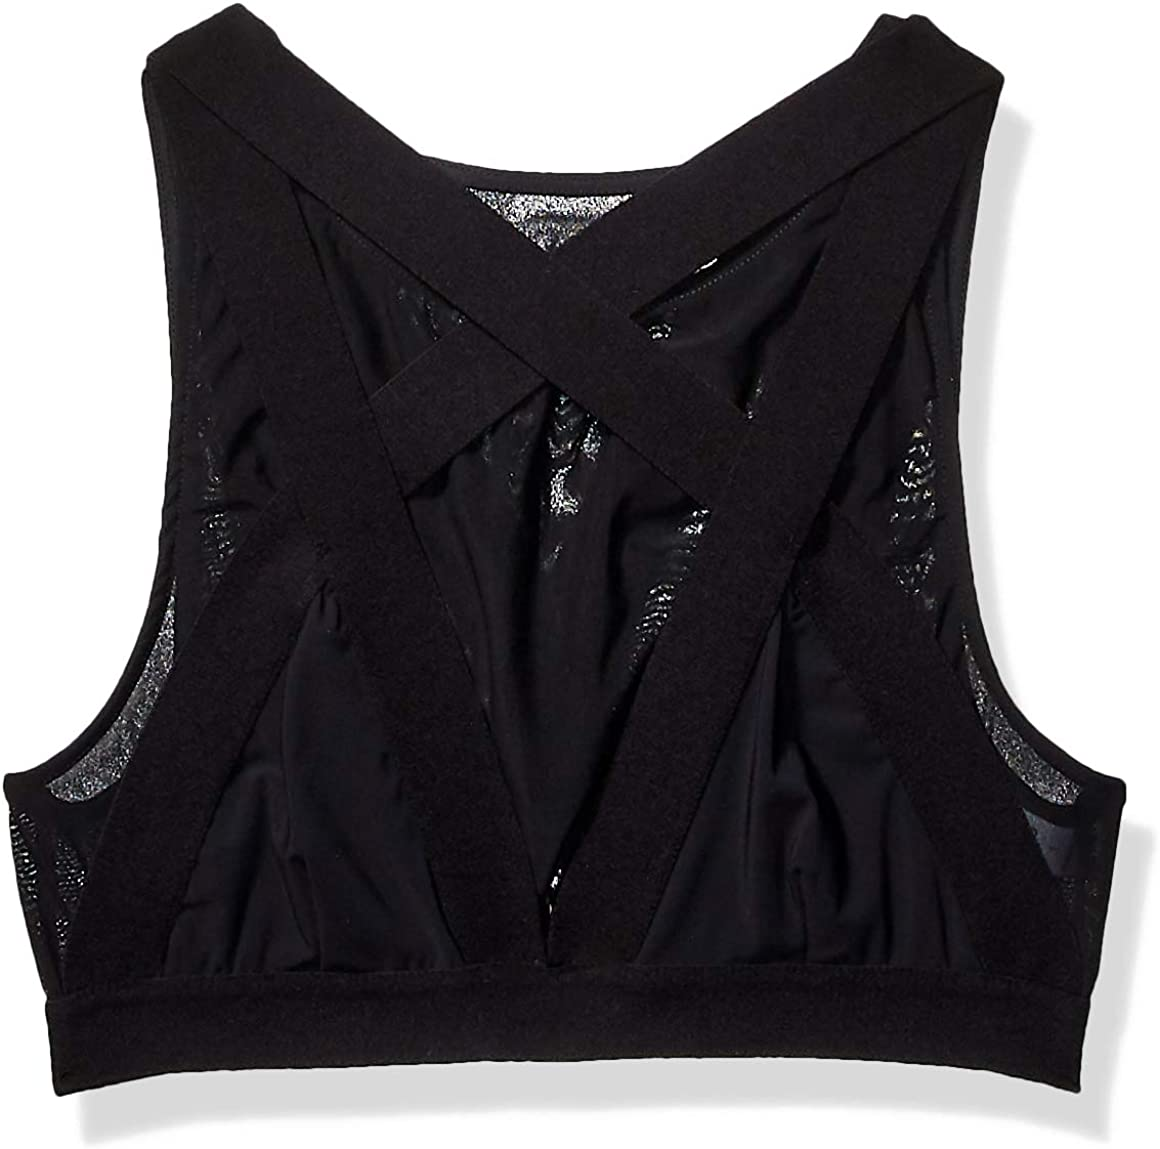 Alo Yoga Women's Workout, Black, One Size